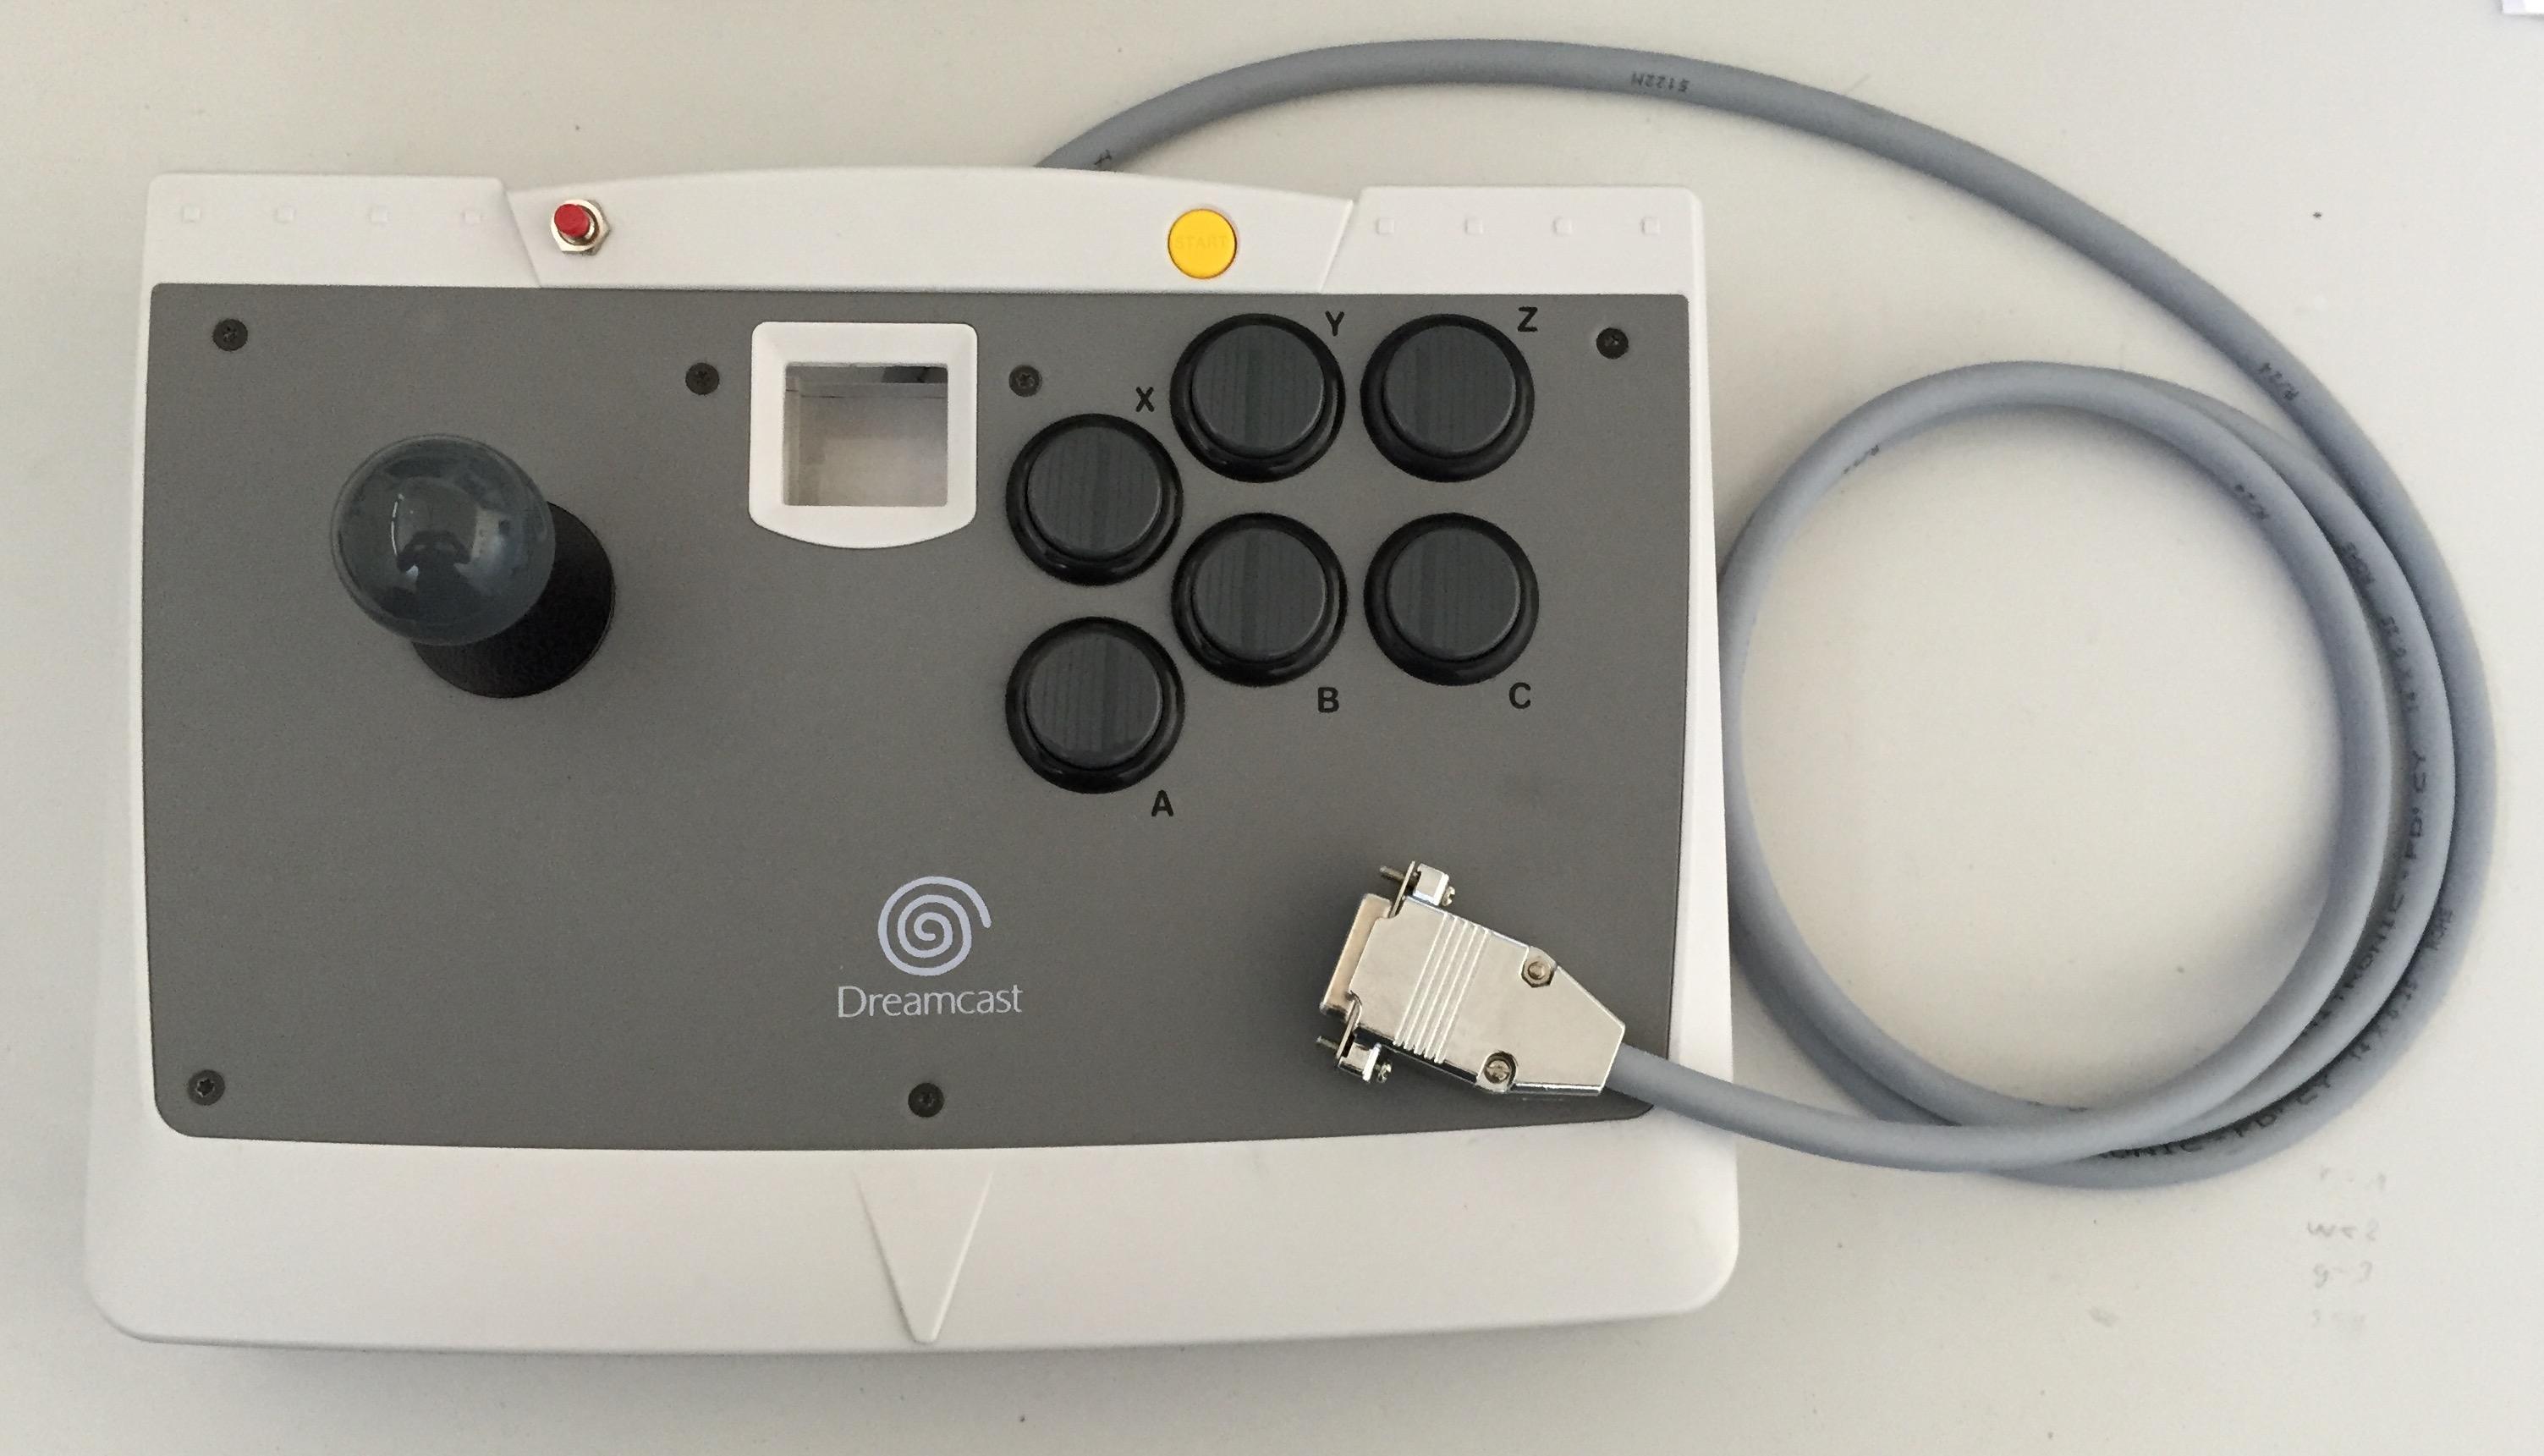 Sega Dreamcast Stick Modded for Supergun